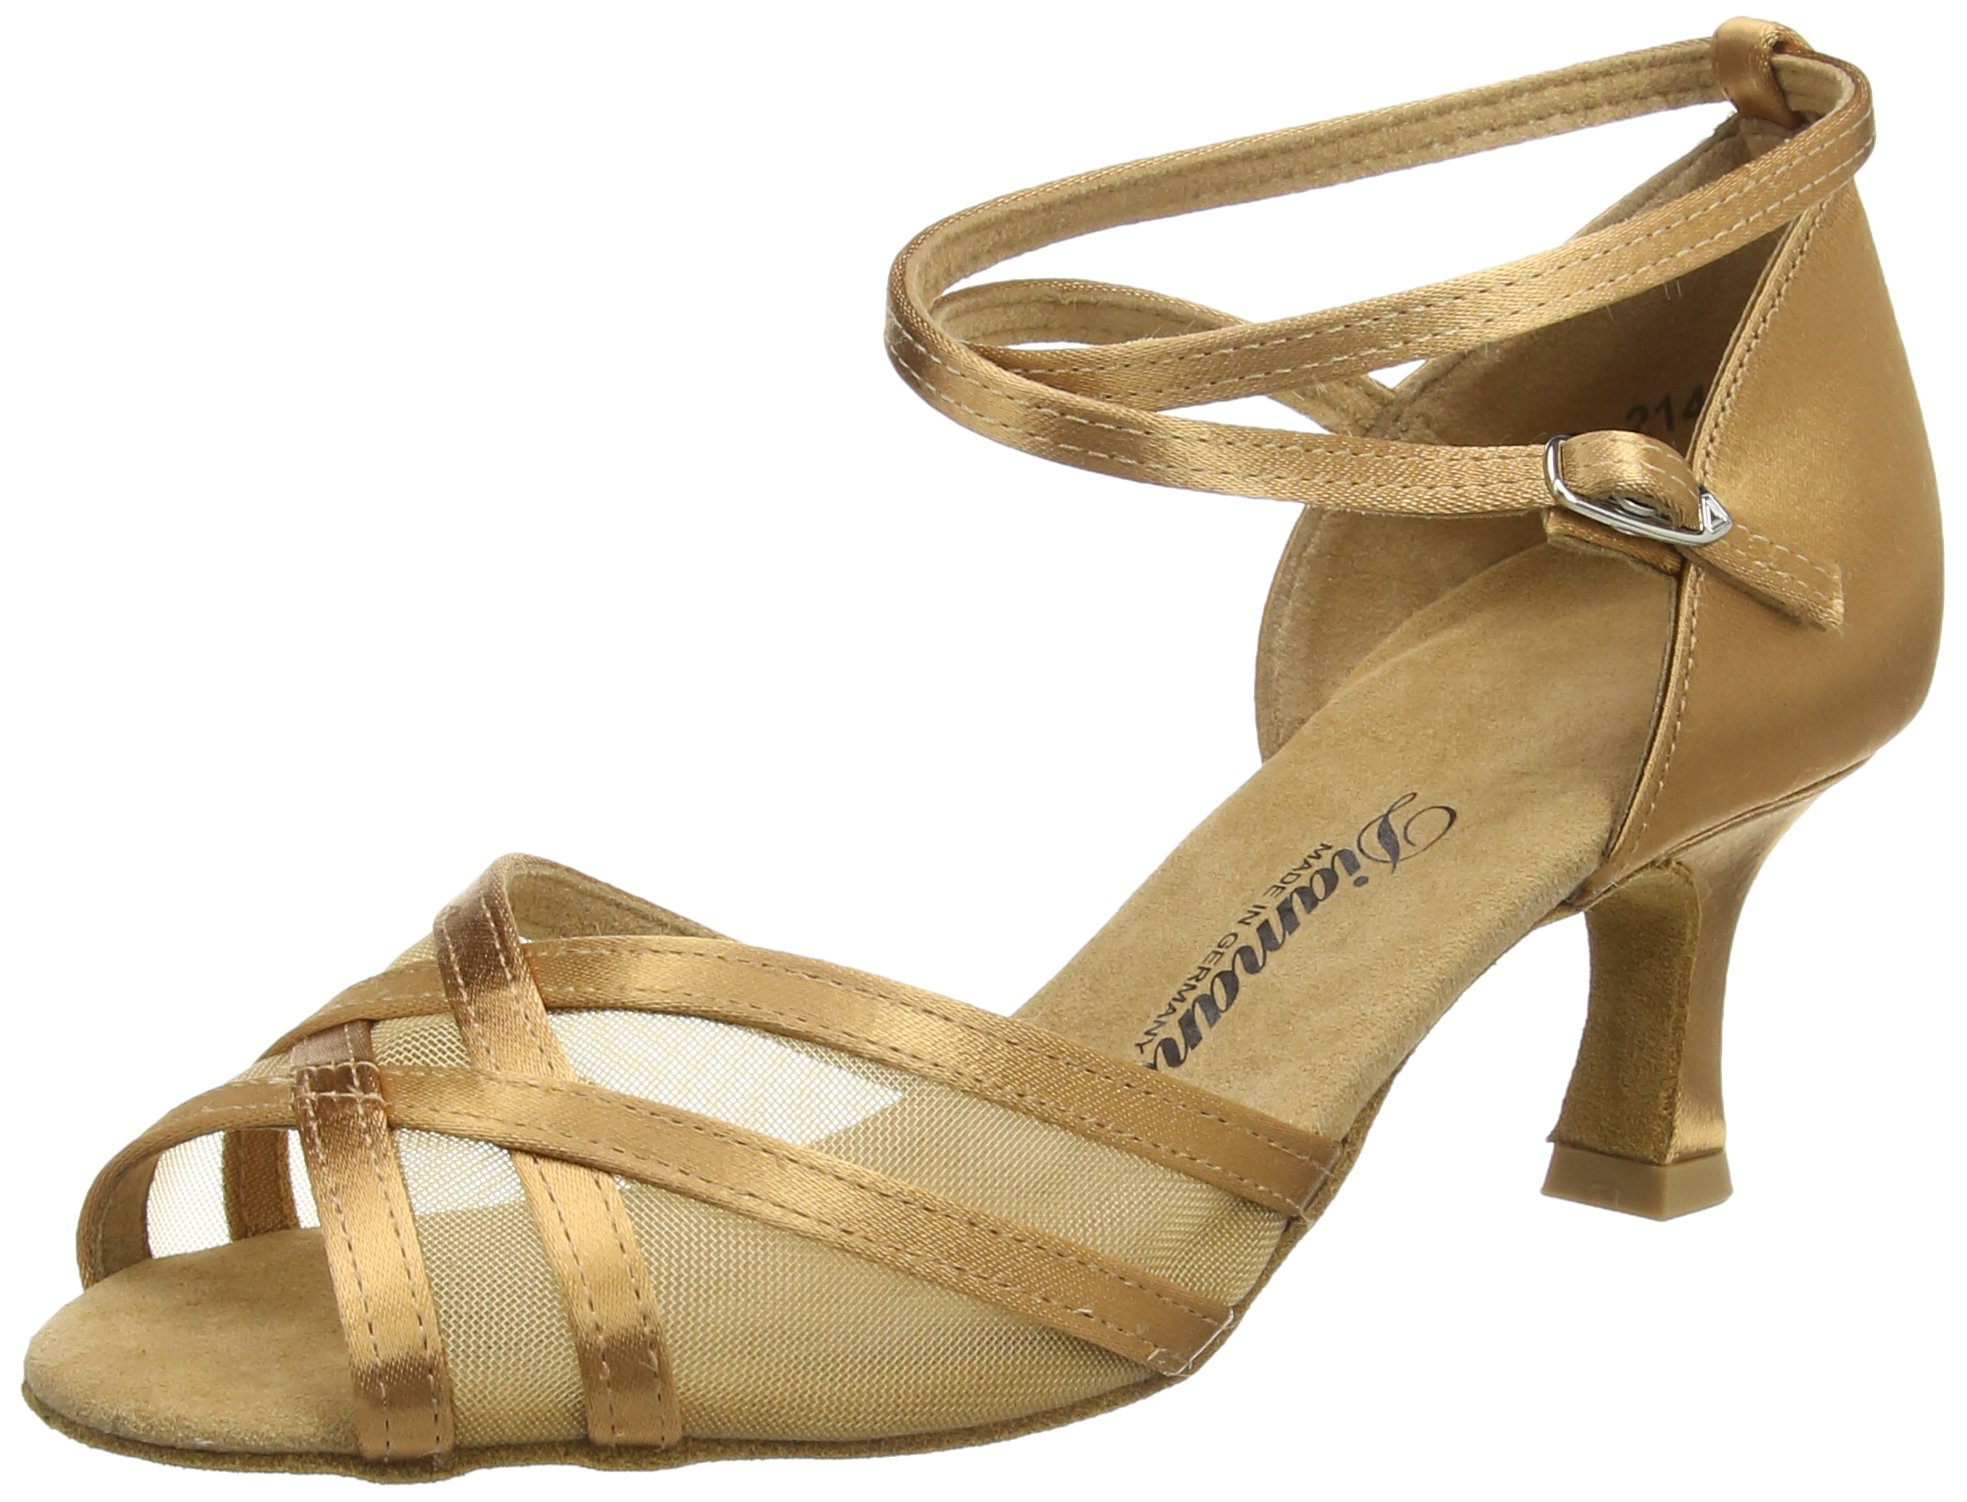 Diamant Womens 035-077-087, Bronze Satin/Mesh, 2'' (5.0 cm) Latin Heel, American 7.5M / UK 5